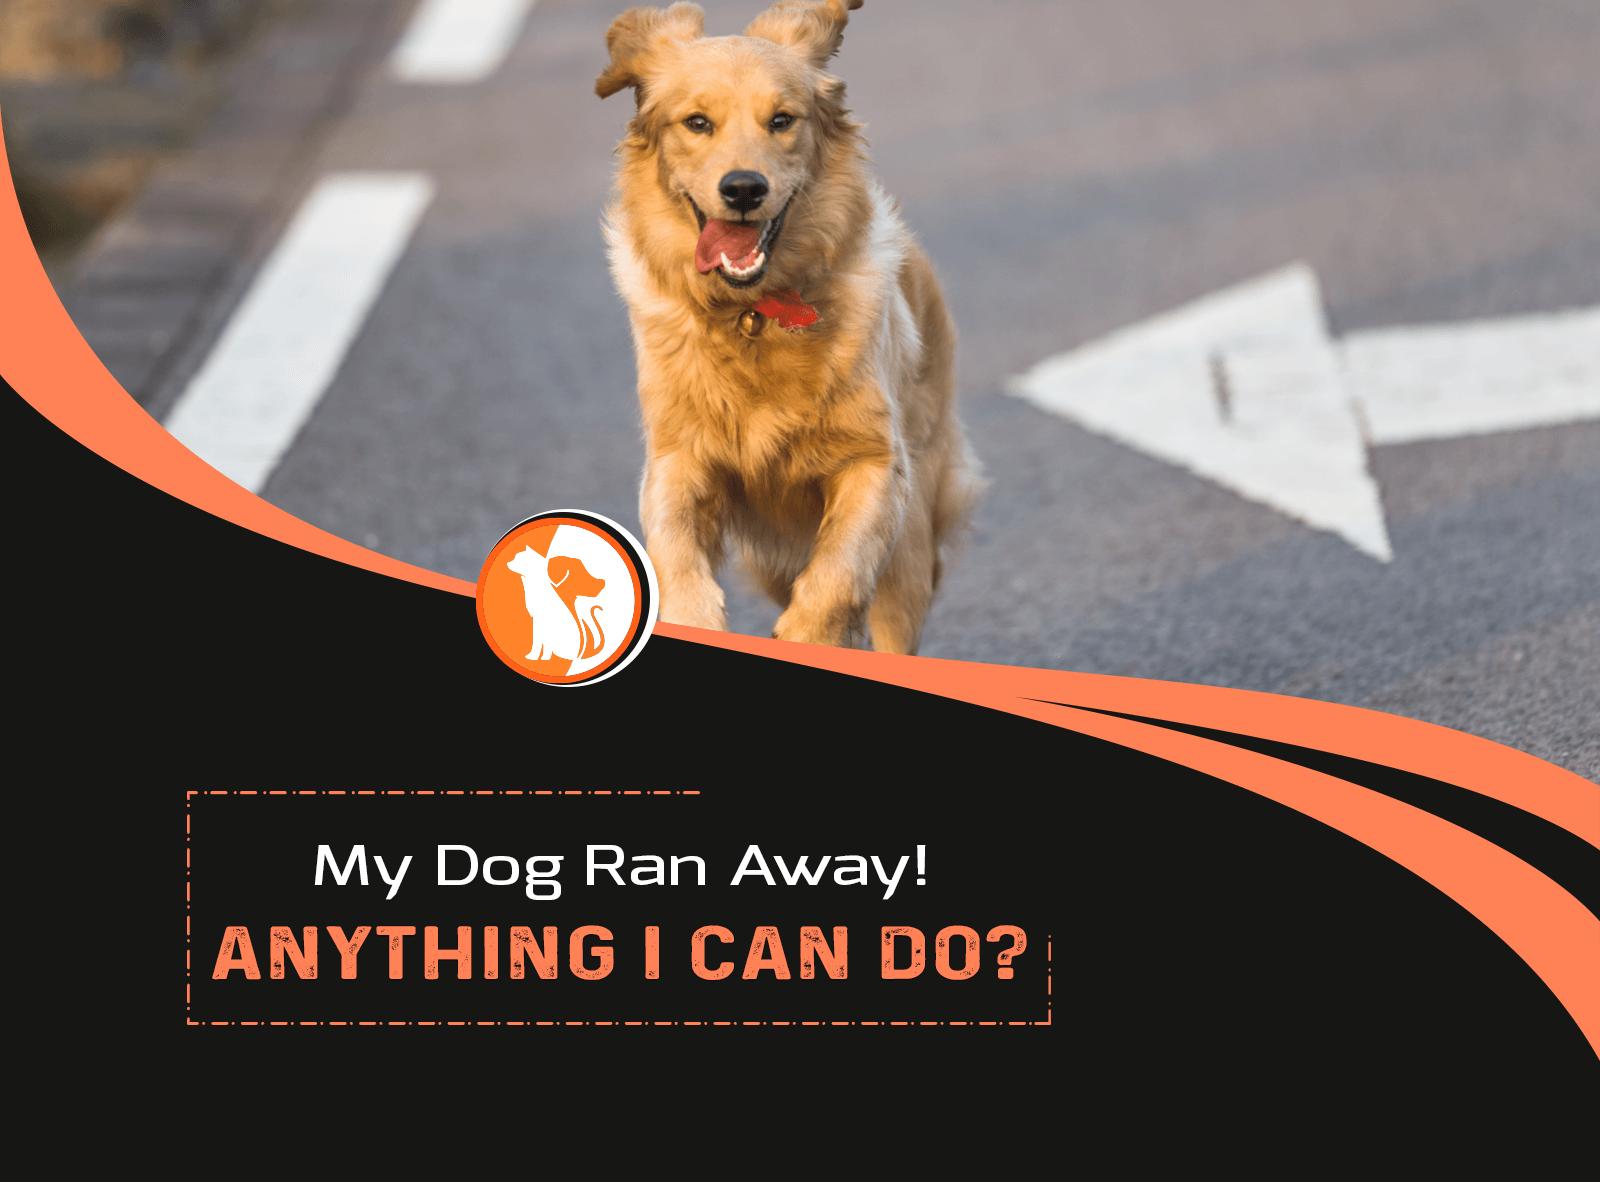 My Dog Ran Away! Anything I Can Do?